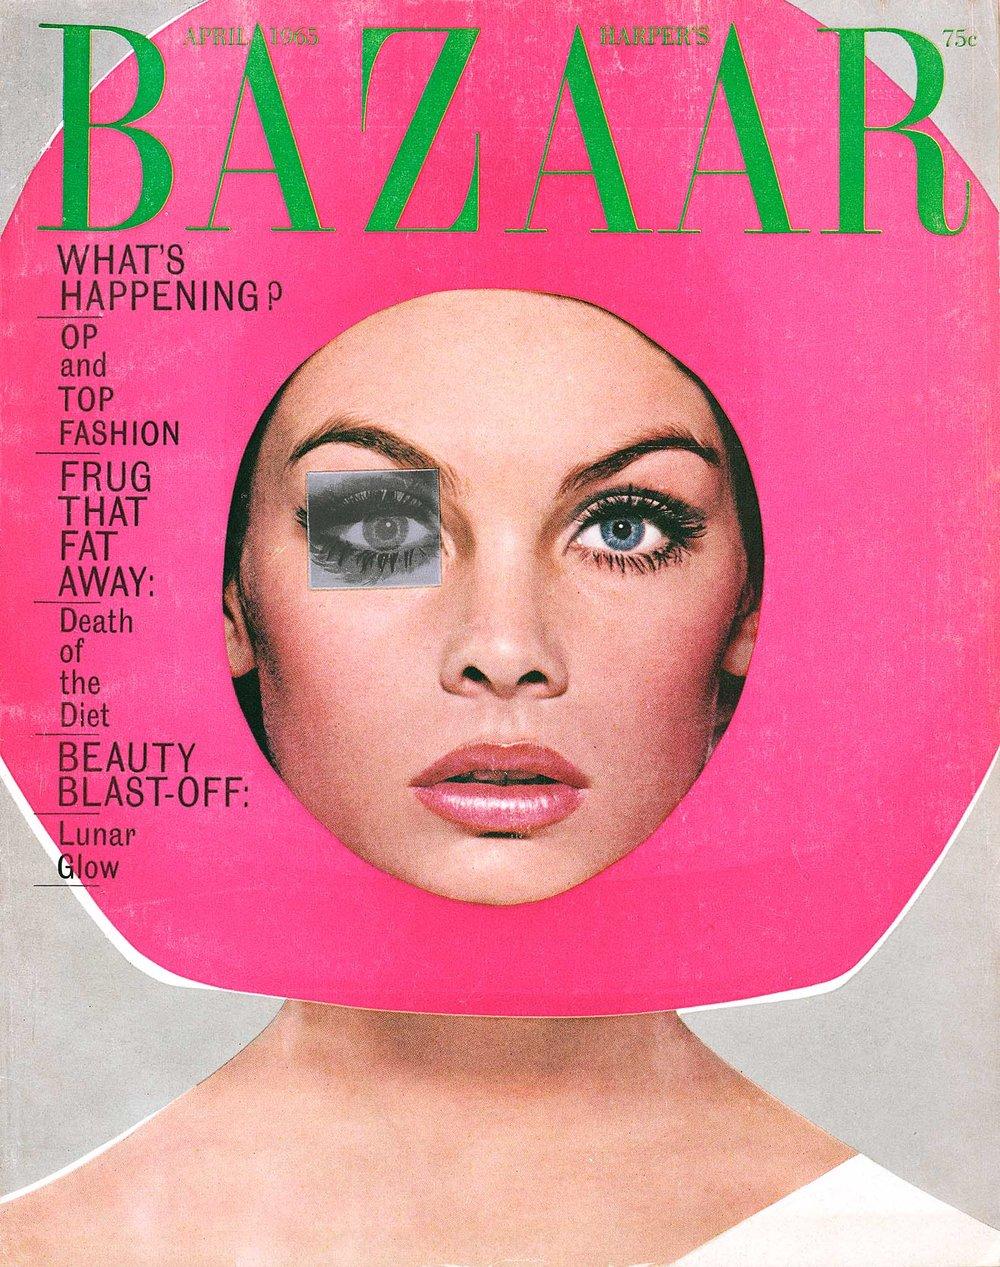 Jean Shrimpton, Helmet by Mr. John,  Harper's Bazaar Cover, 1965.jpg